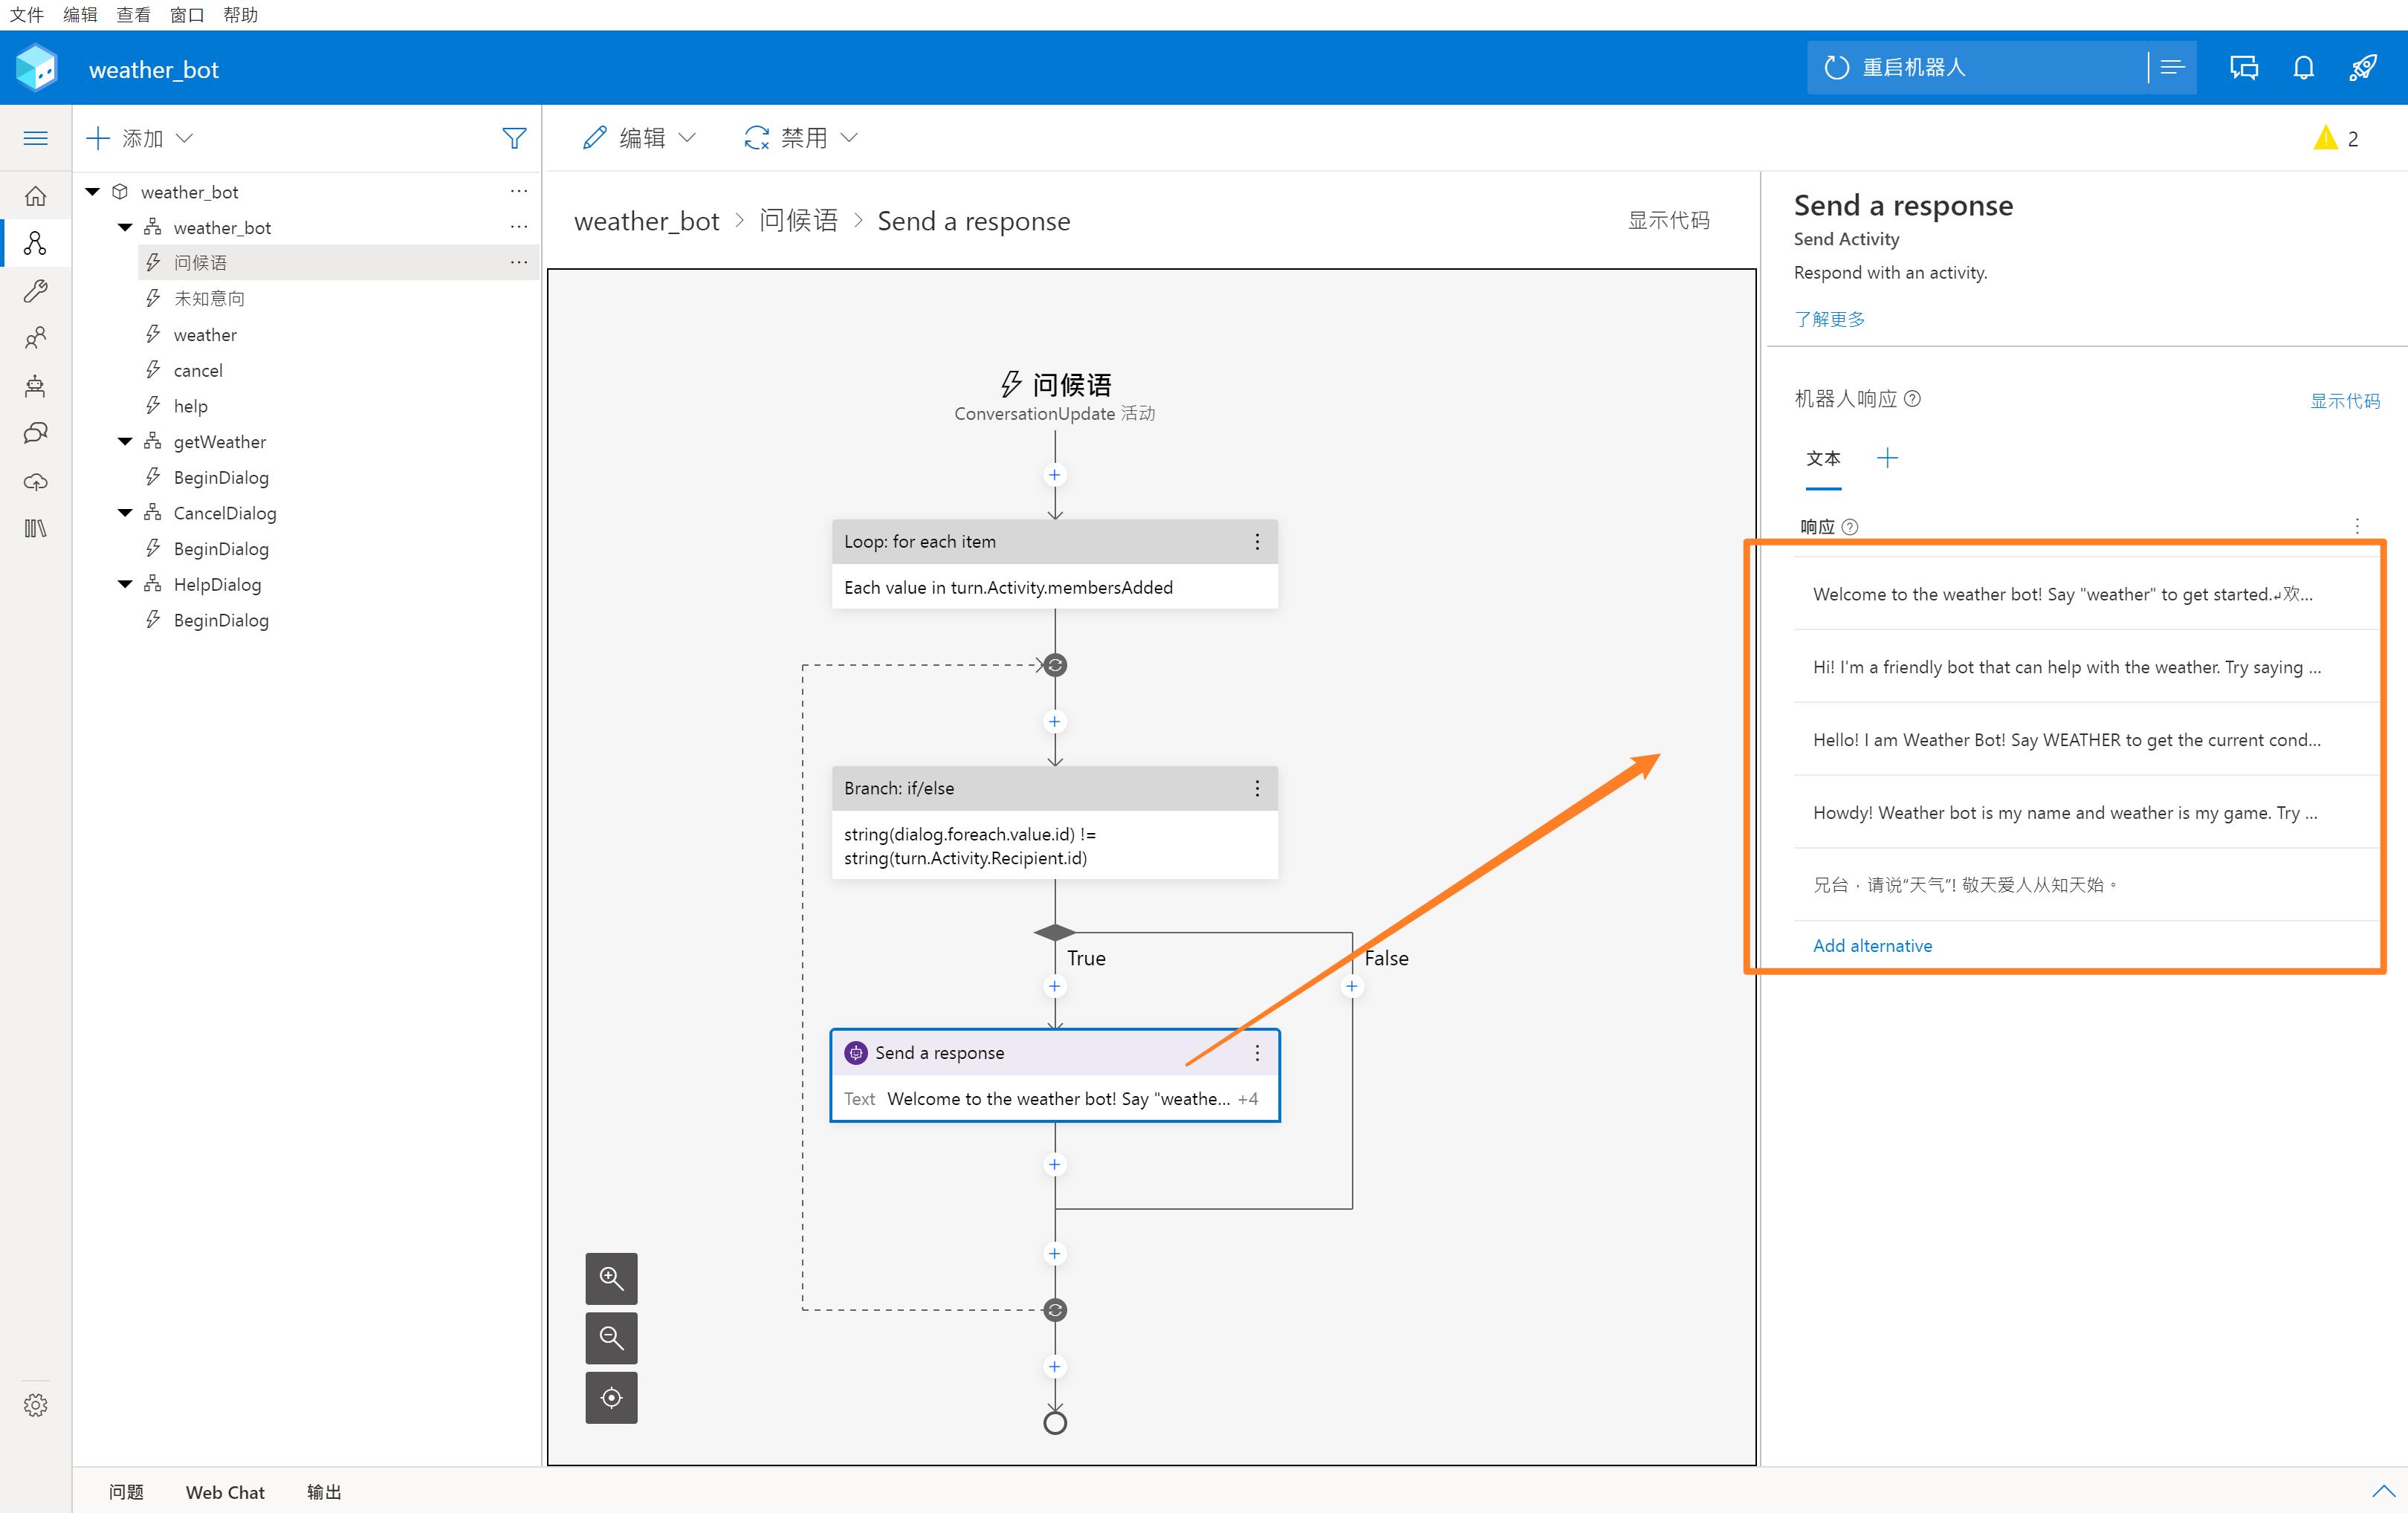 【Azure 機器人】微軟Azure Bot 編輯器系列(4) : 使用語言生成功能[LG: Language Generation] (The Bot Framework Composer tutorials)